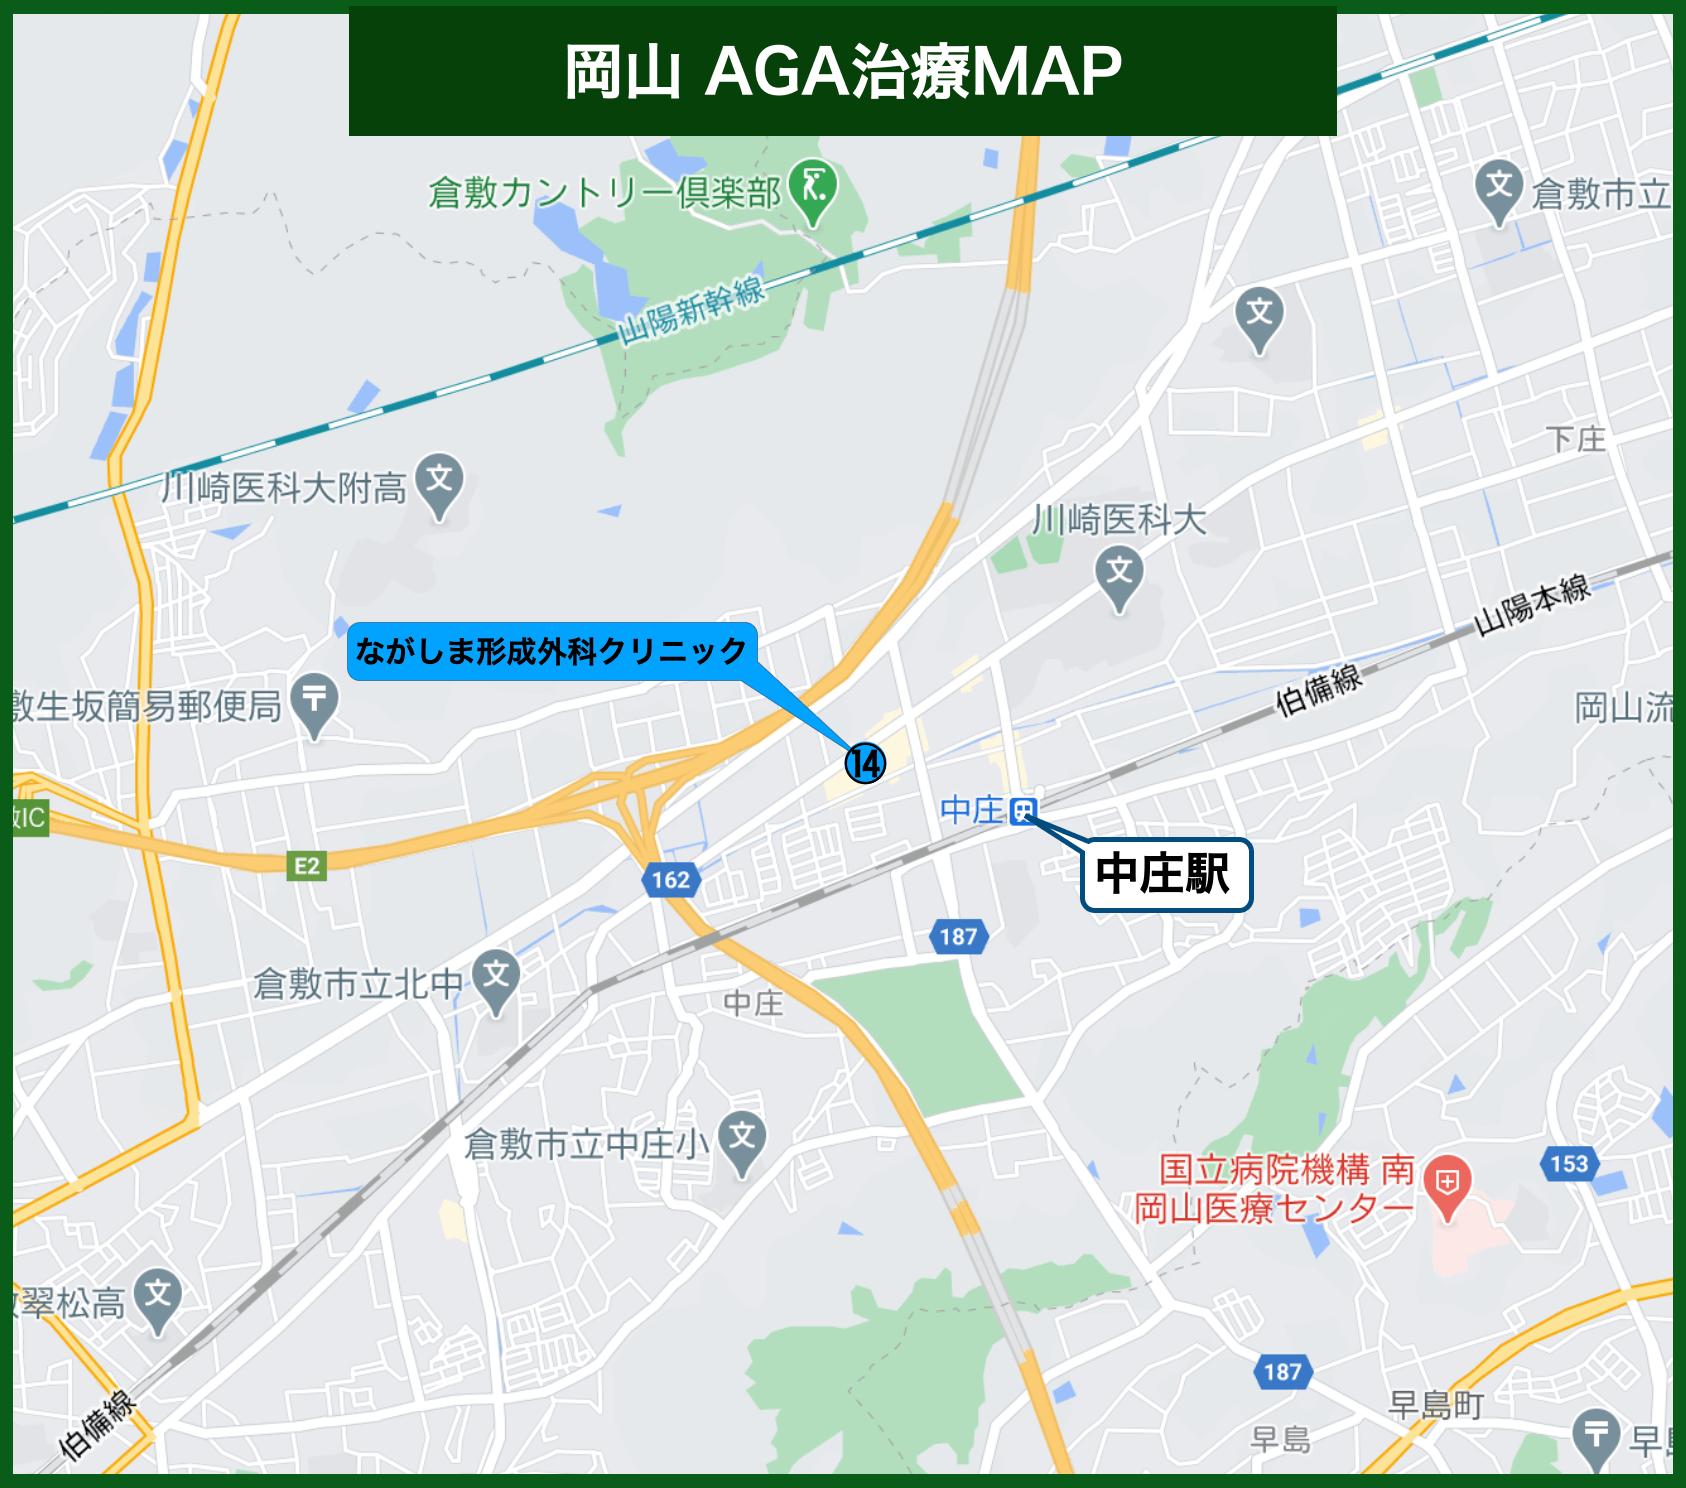 岡山AGA治療MAP